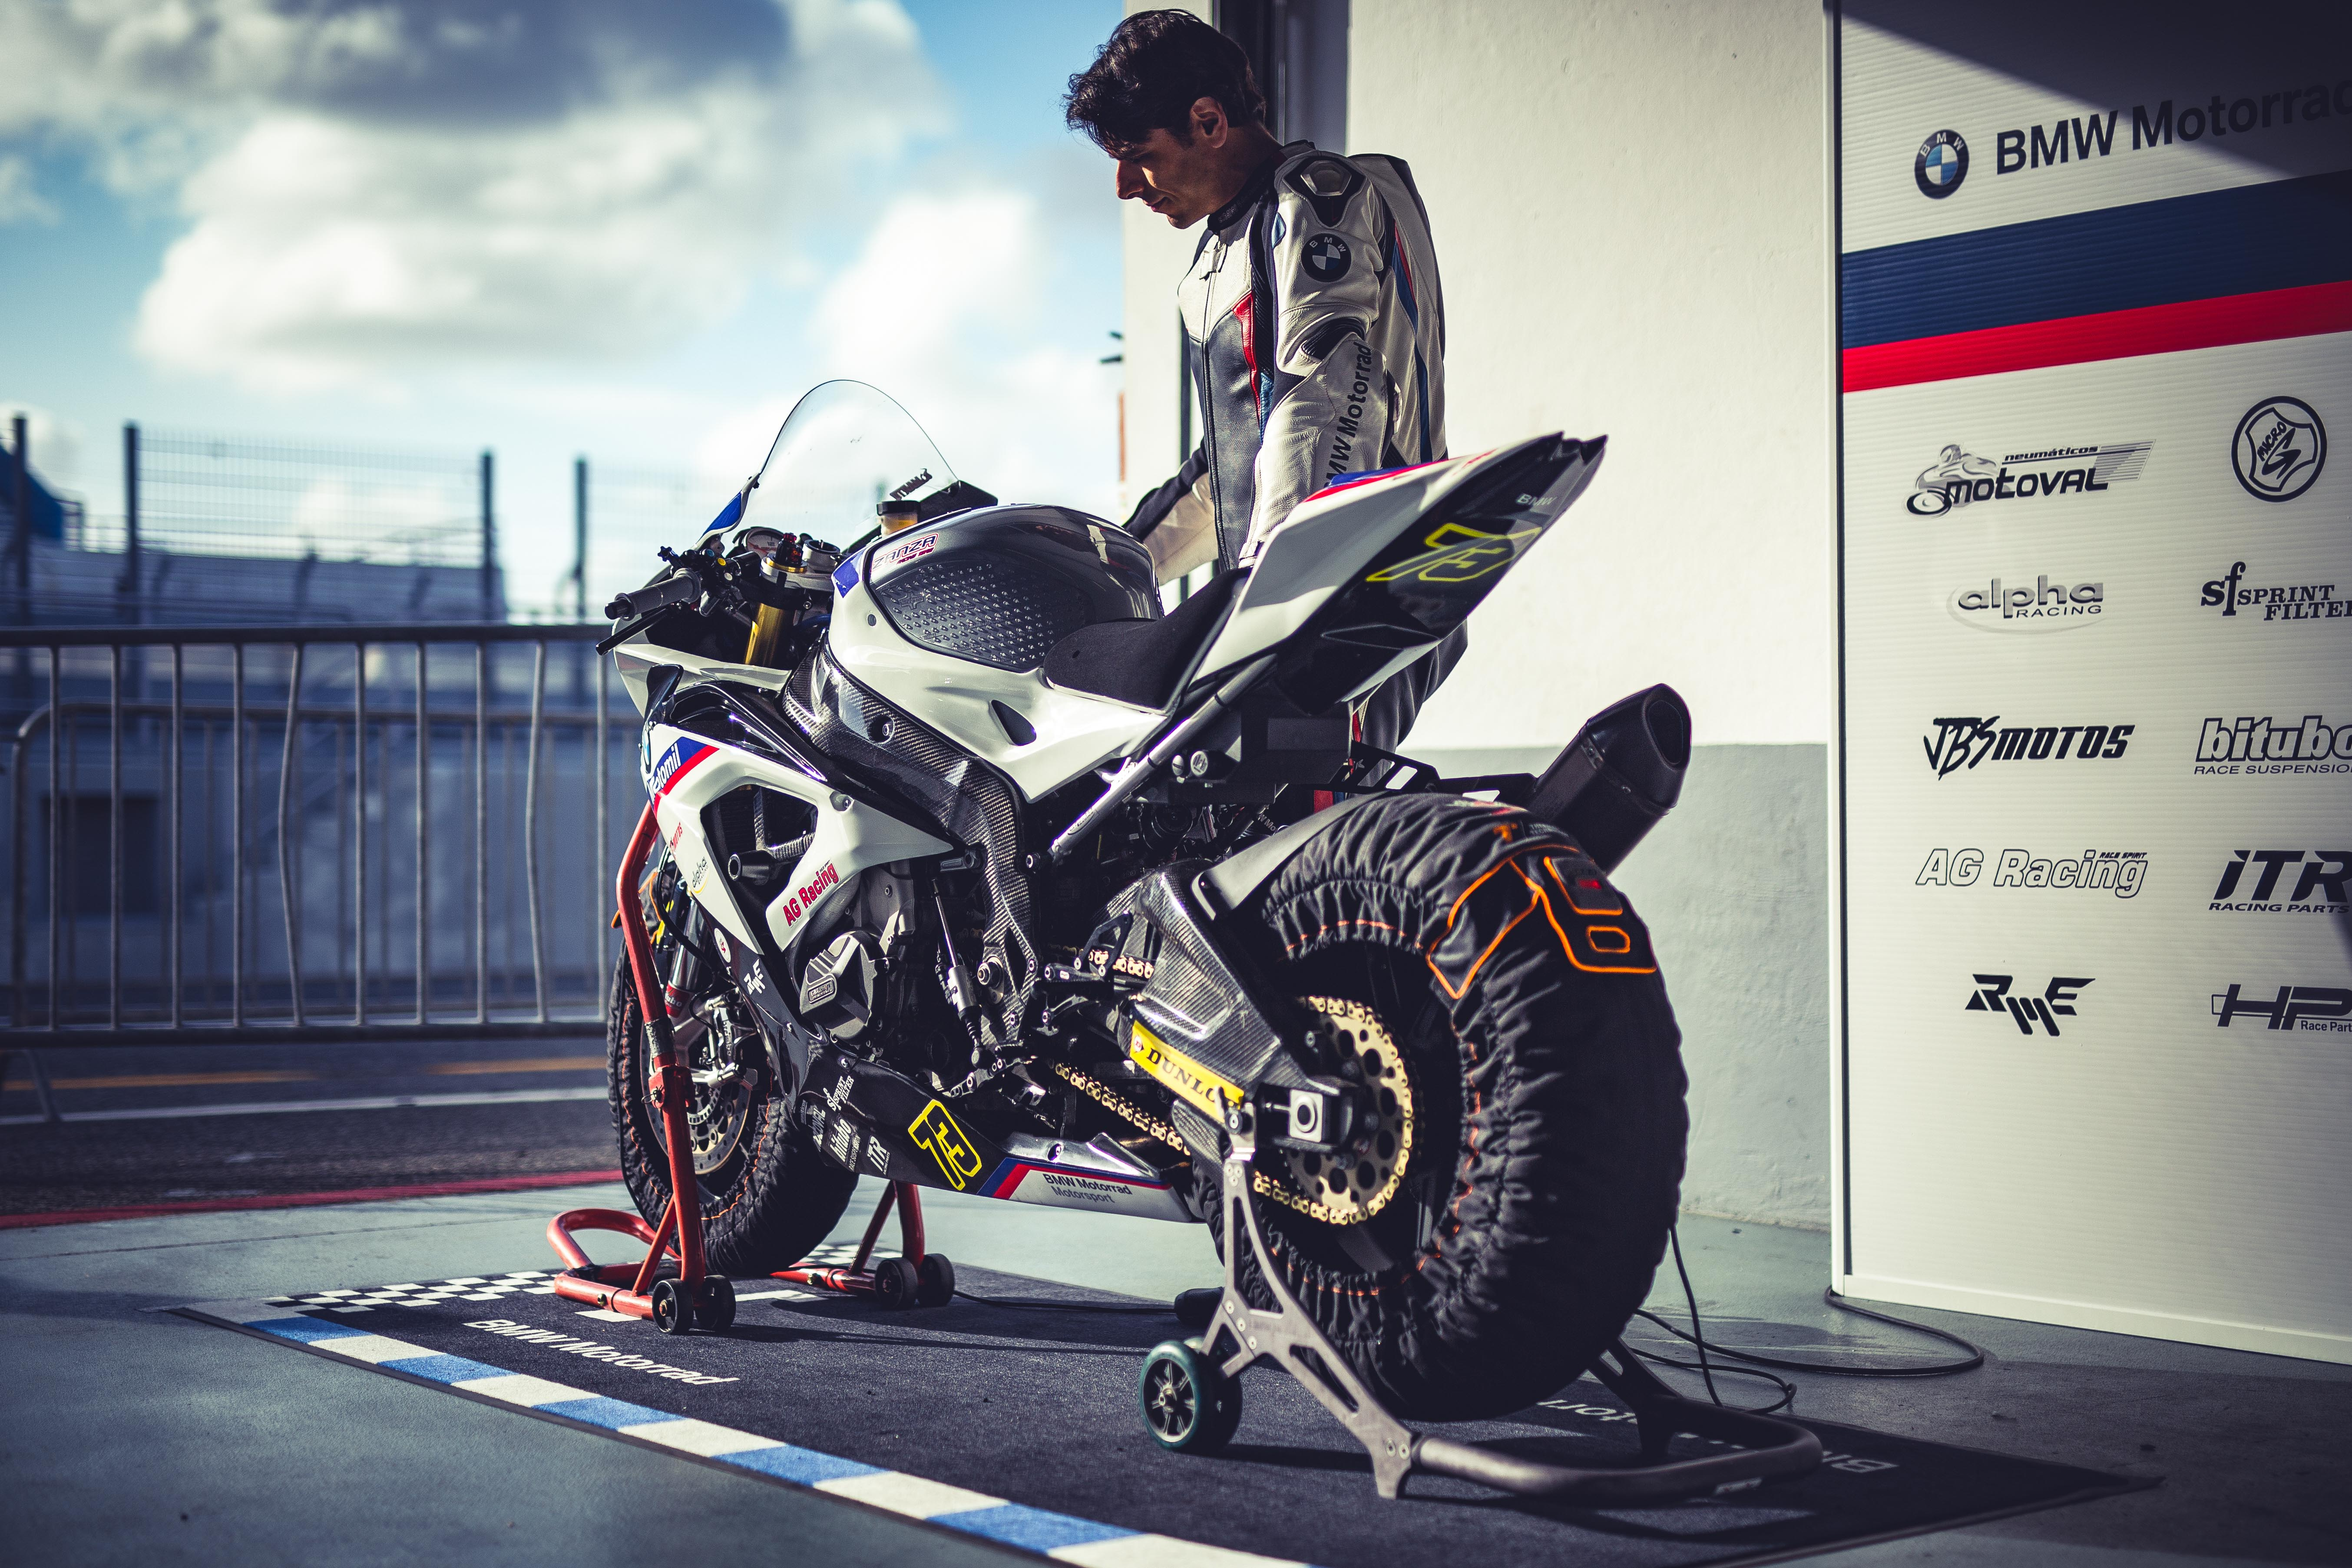 BMW MOTORRAD PT RACING TEAM